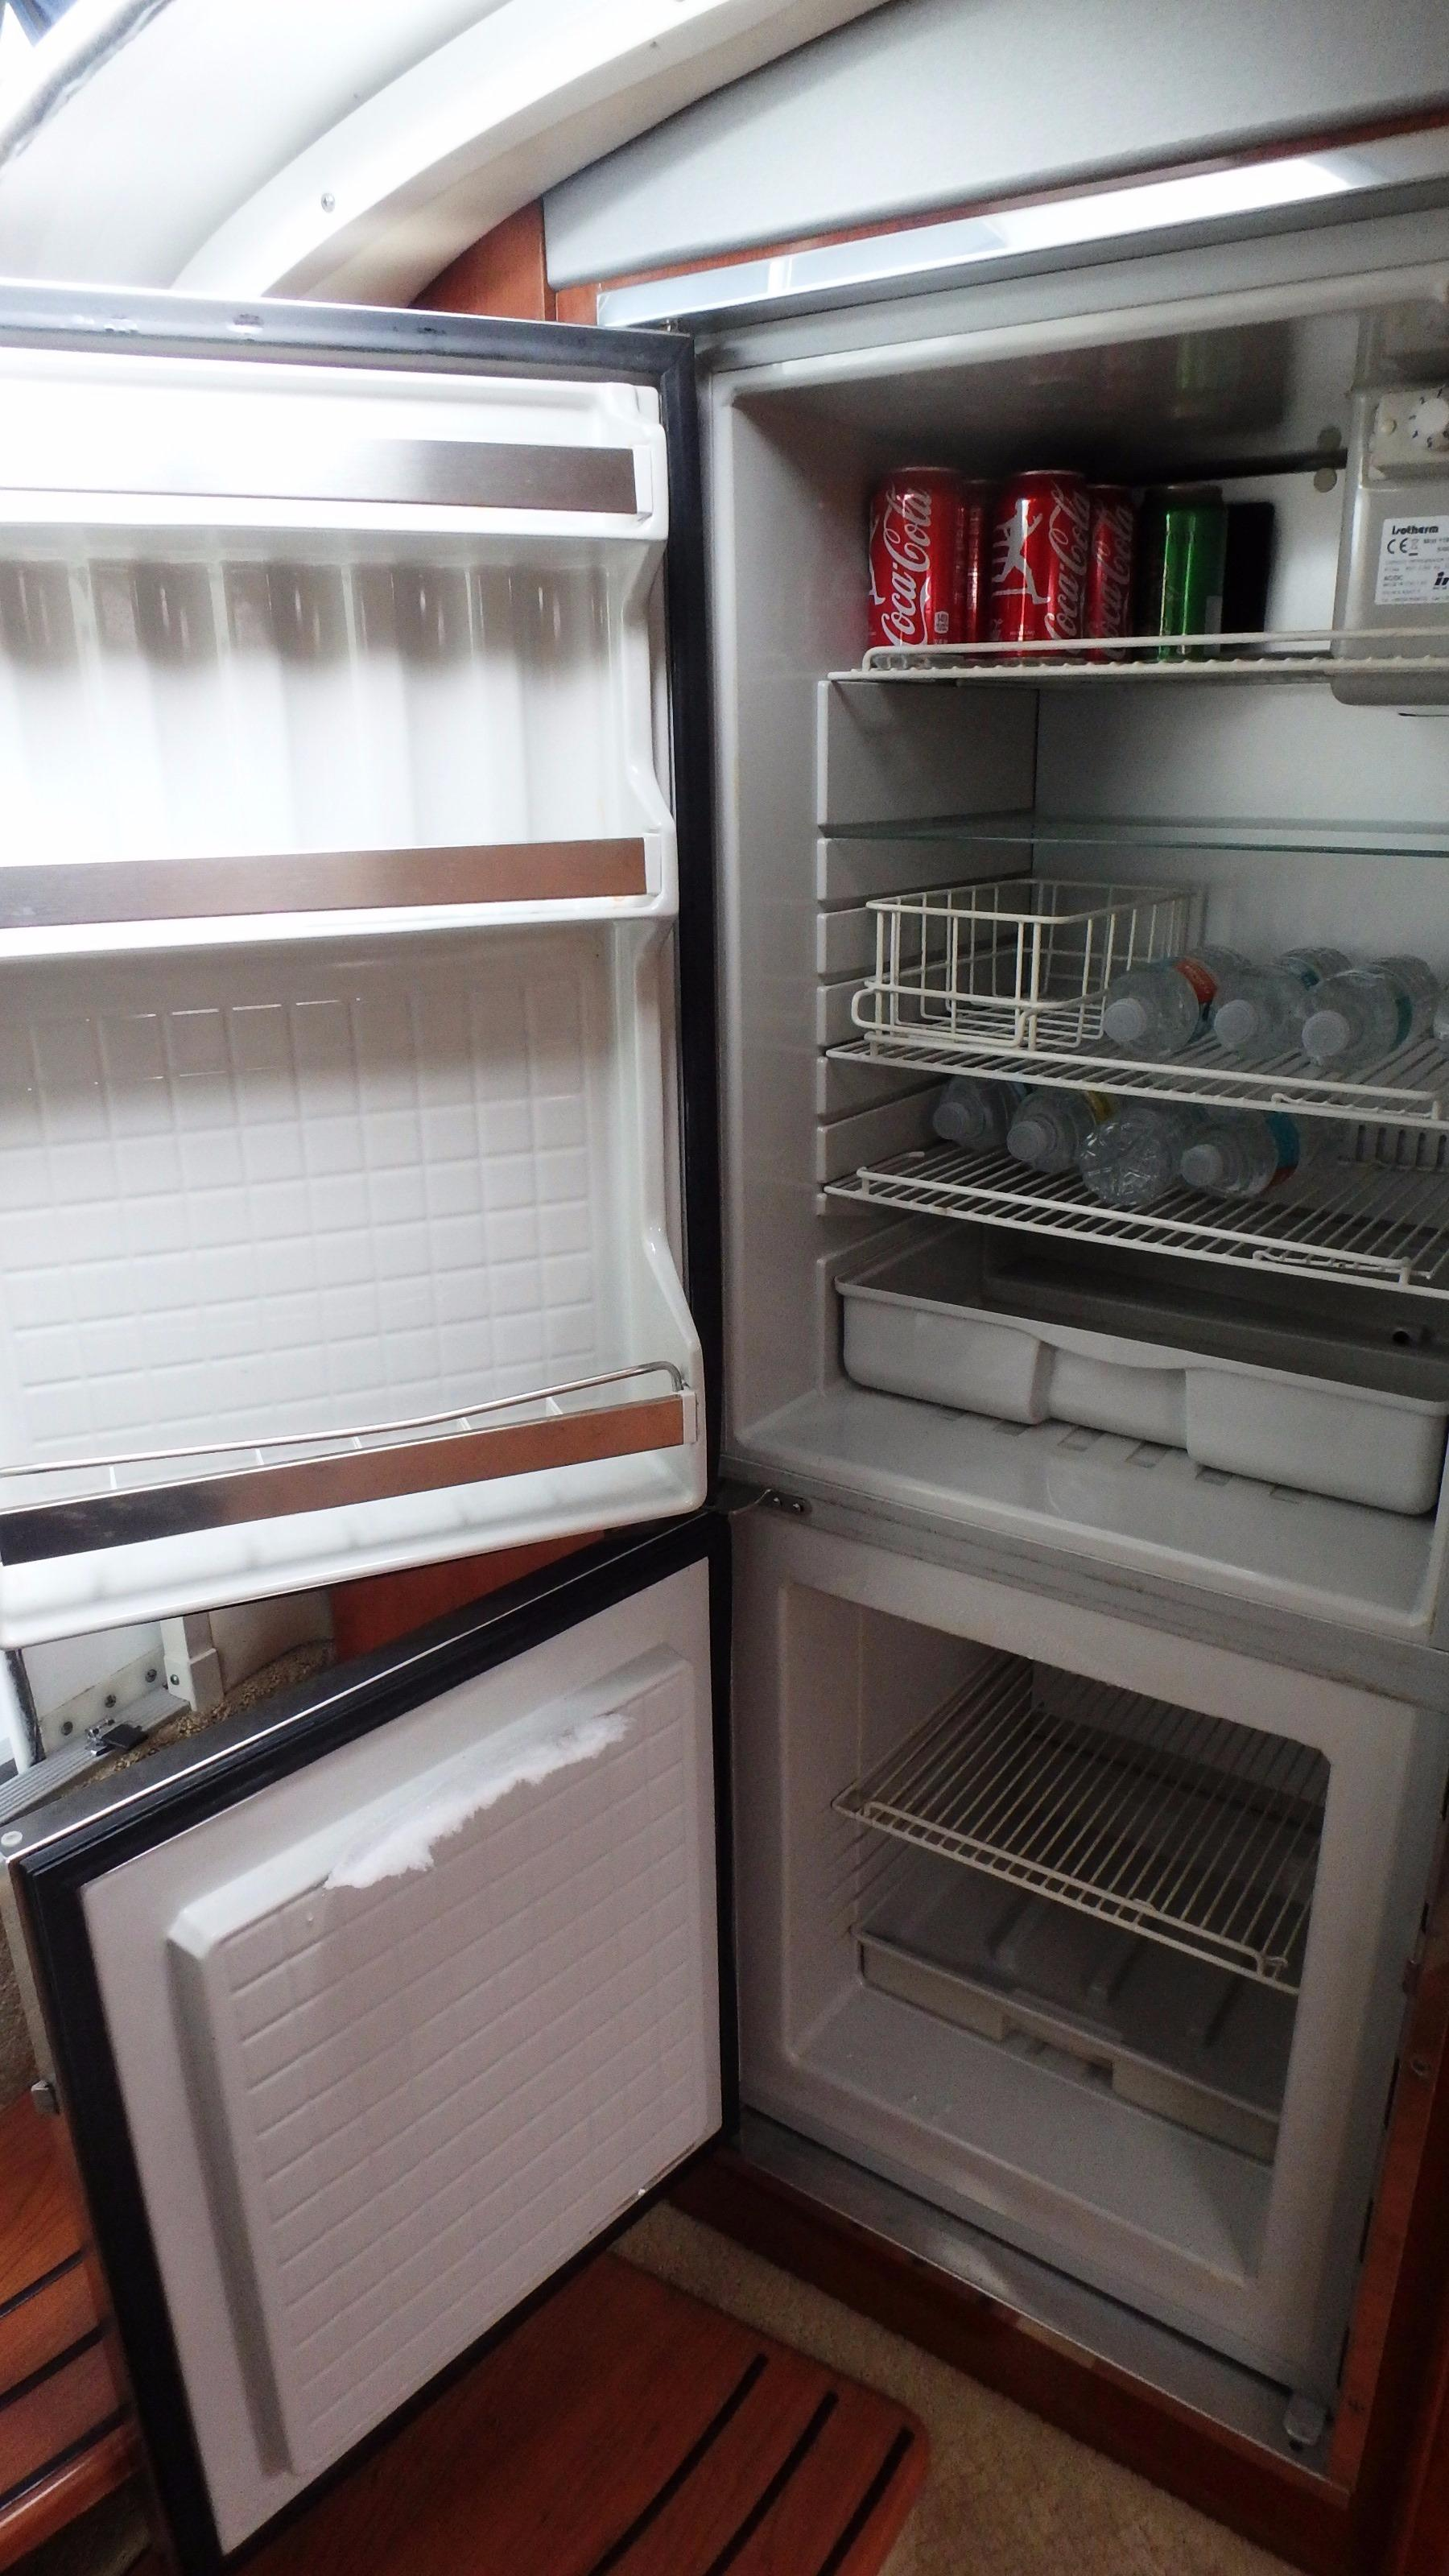 Cabin refrigerator